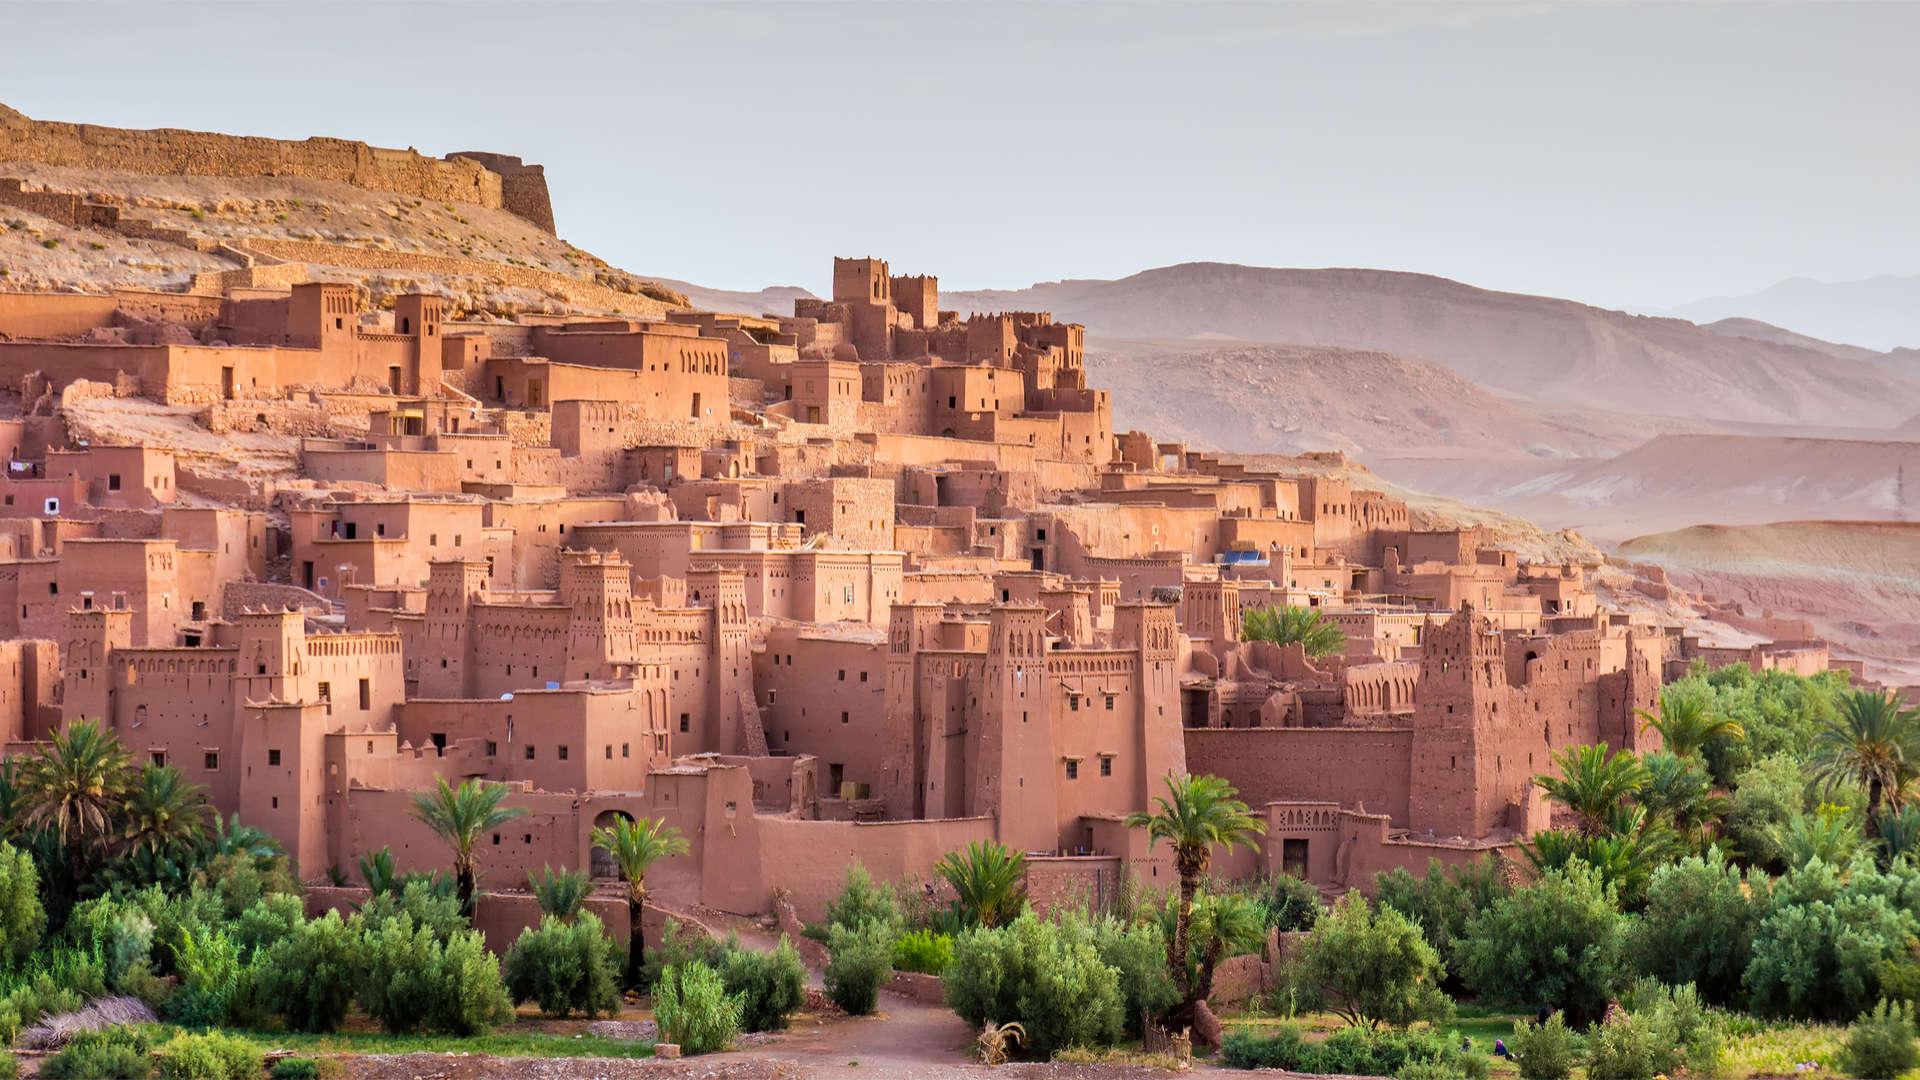 Afrika | Marokko | ©Ivoha/Shutterstock.com